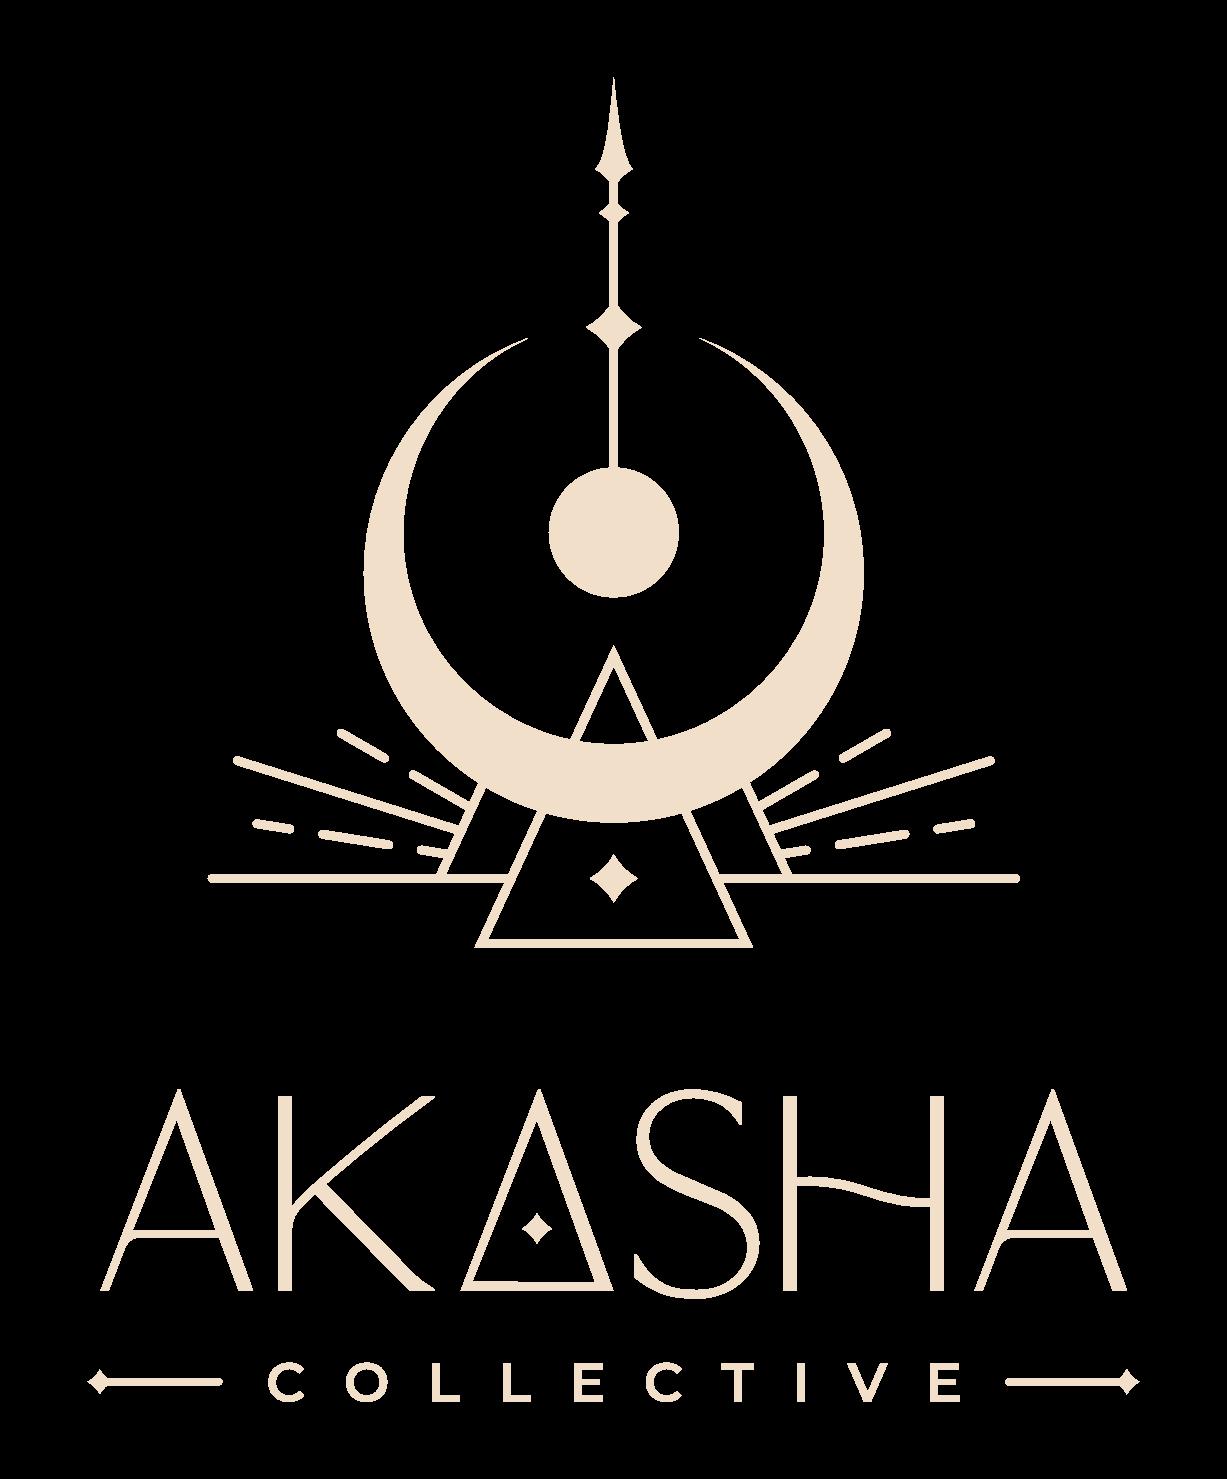 akasha collective logo